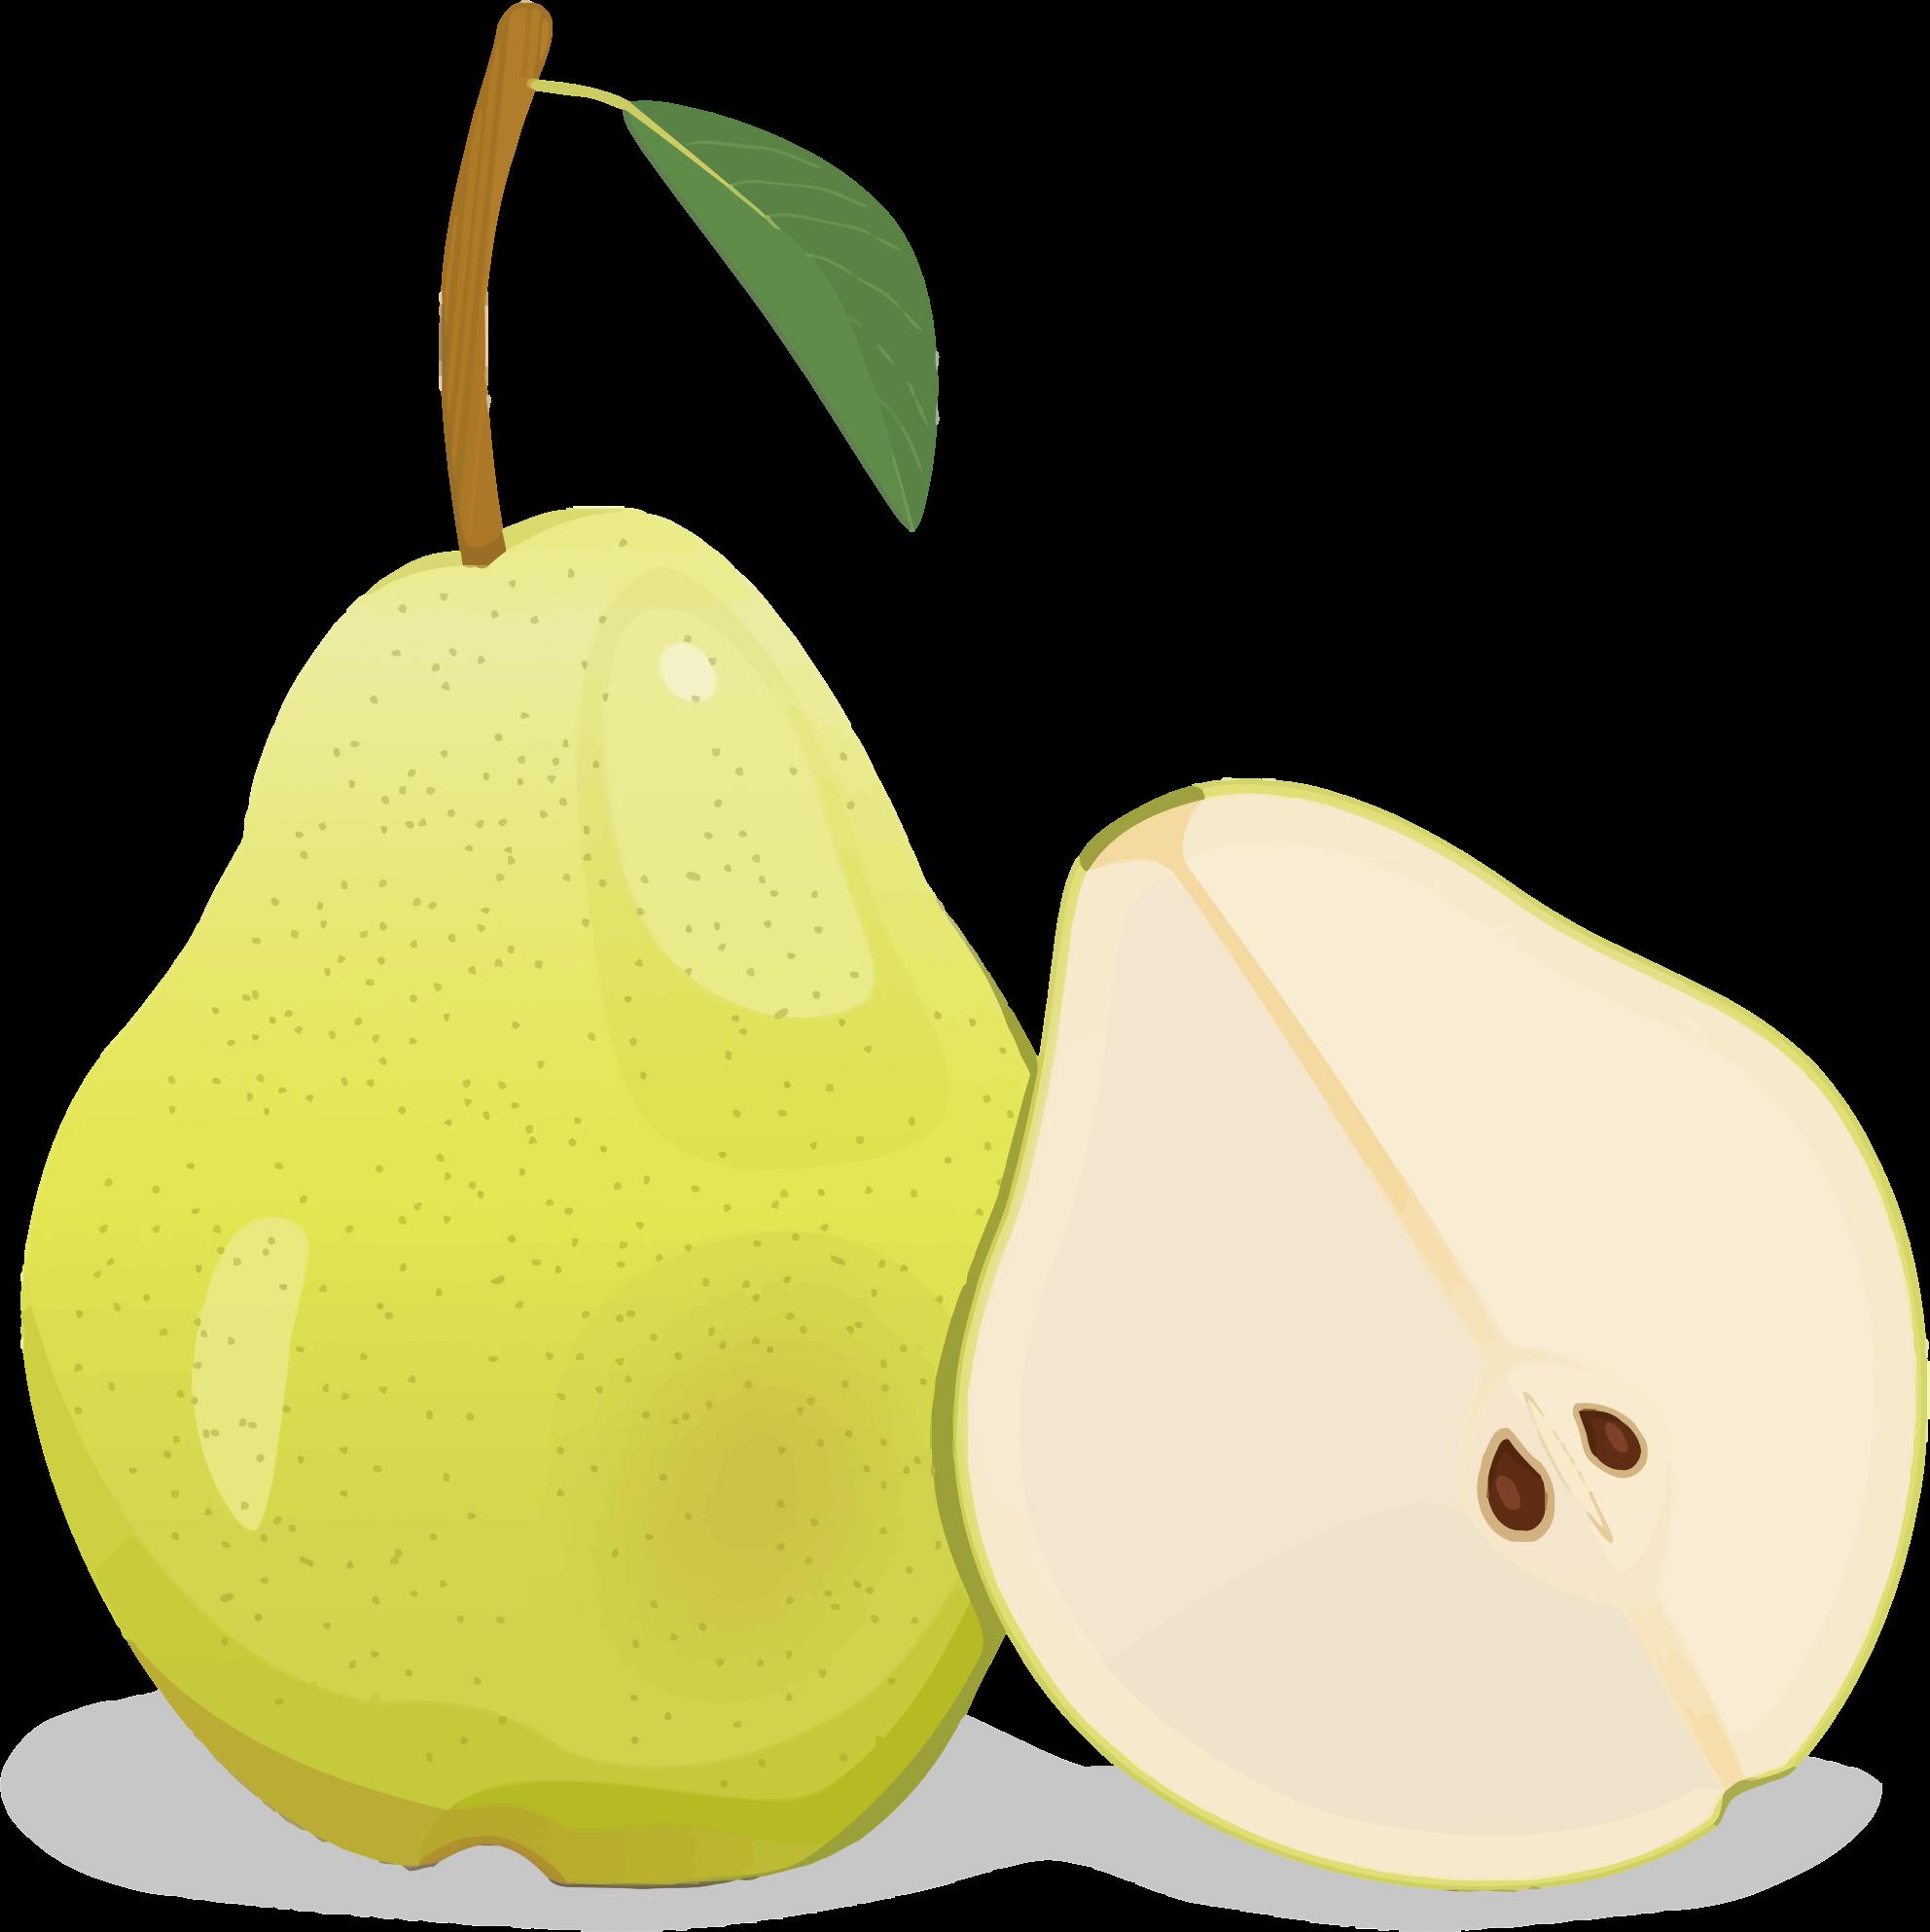 shaped cartoon. Pear clipart pear shape